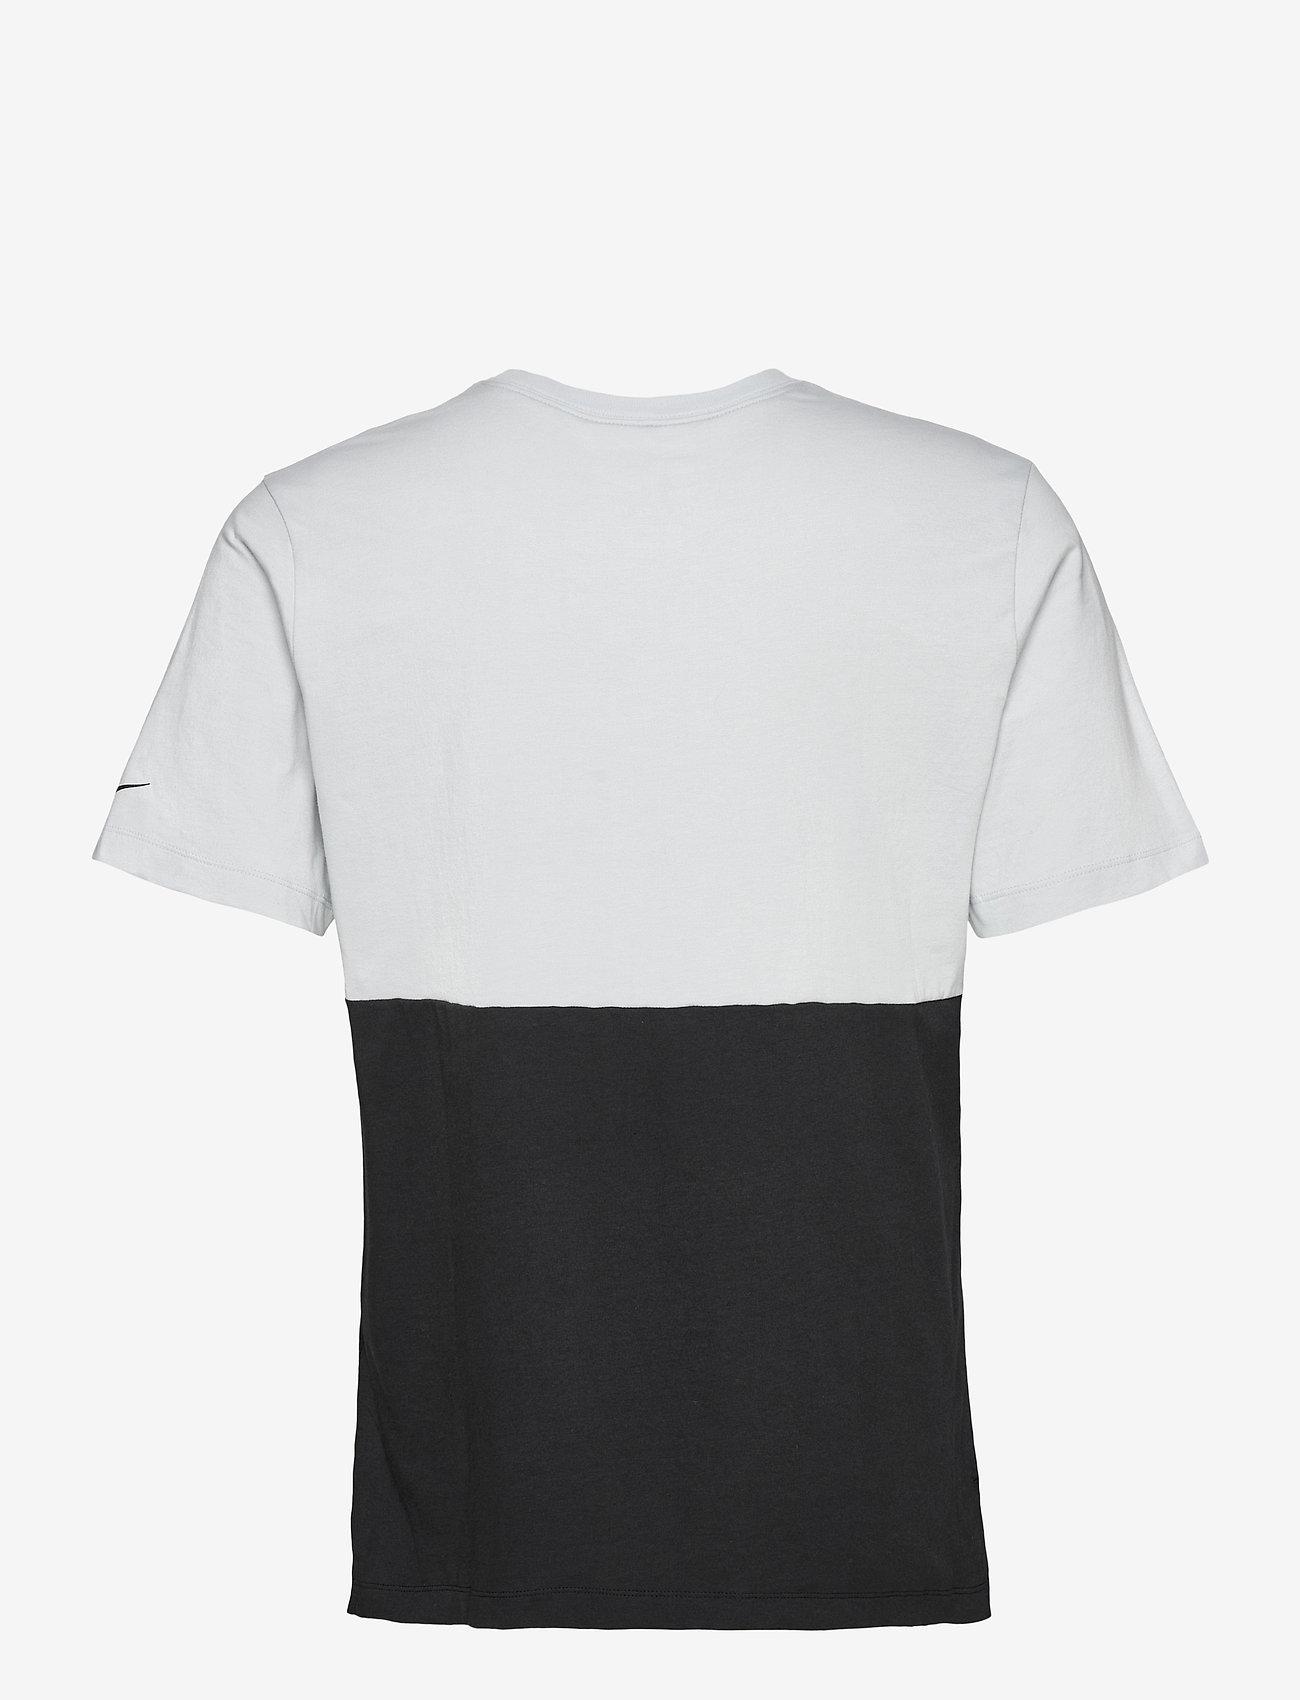 NIKE Fan Gear Las Vegas Raiders Nike Logo Name Colorblock T-Shirt - T-skjorter FIELD SILVER / BLACK - Menn Klær